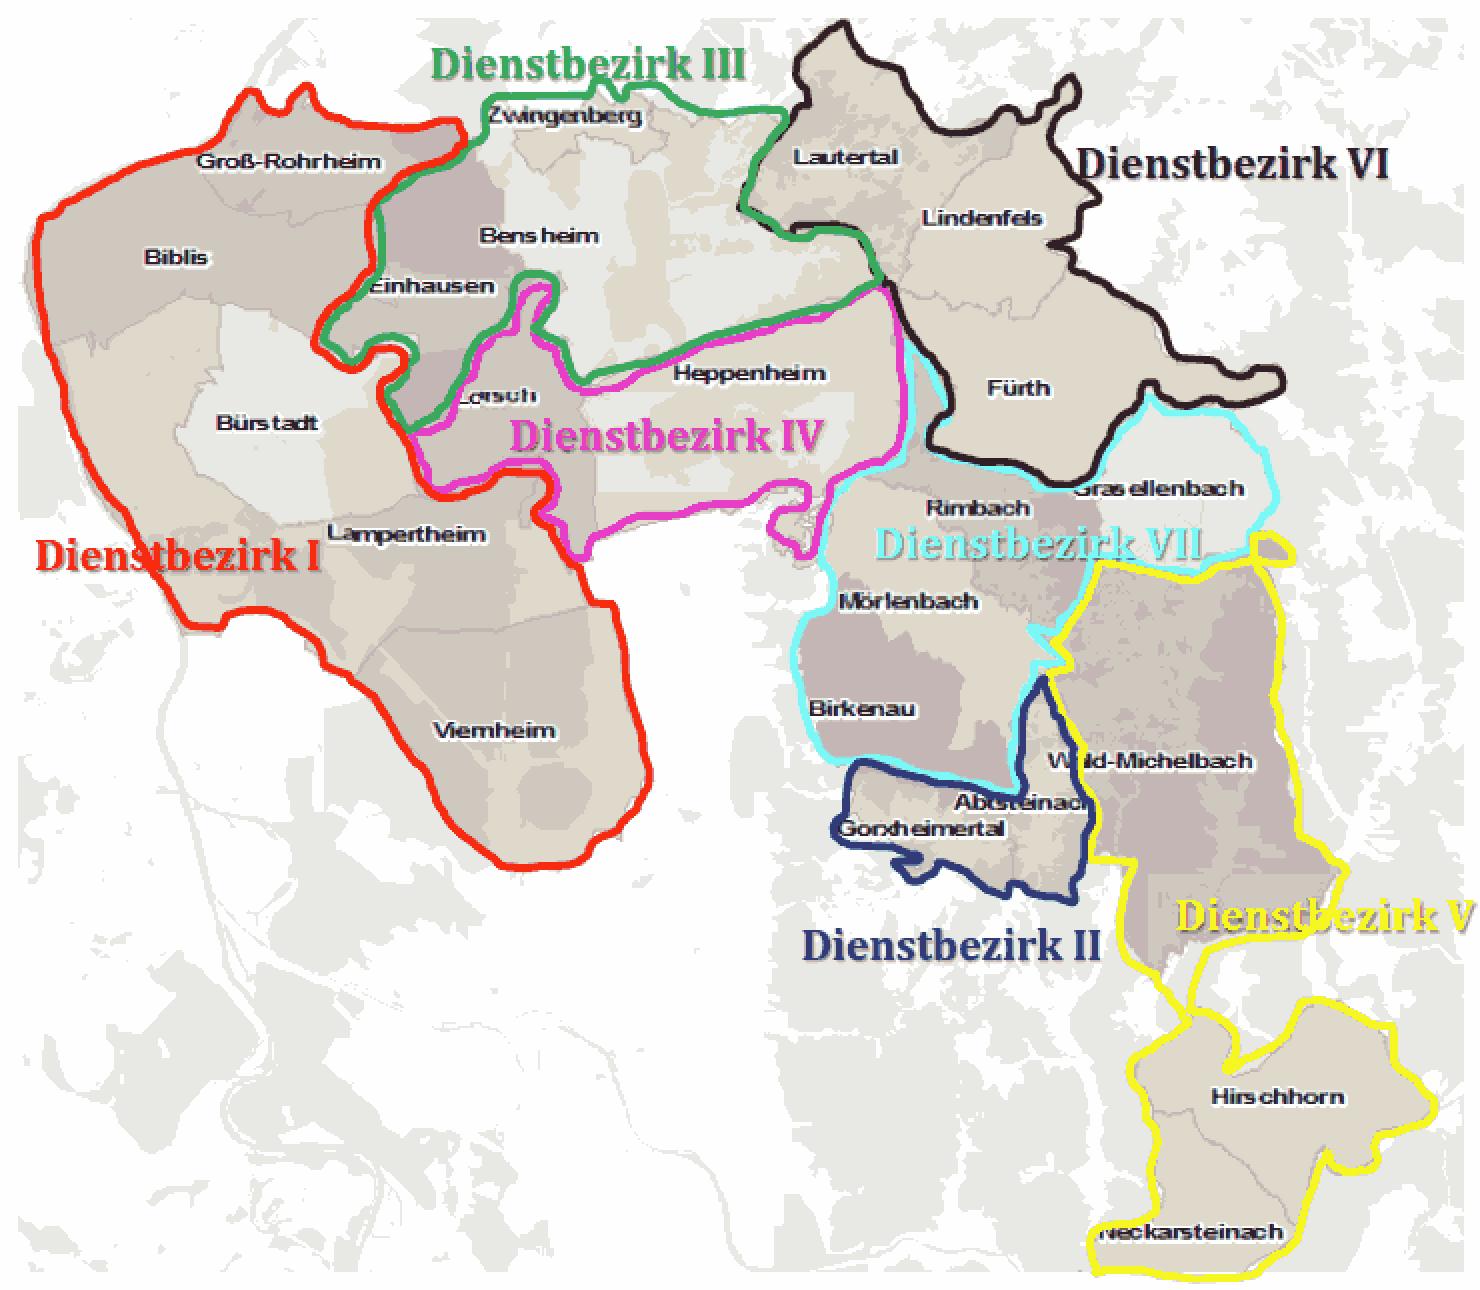 bsv_dienstbezirke1